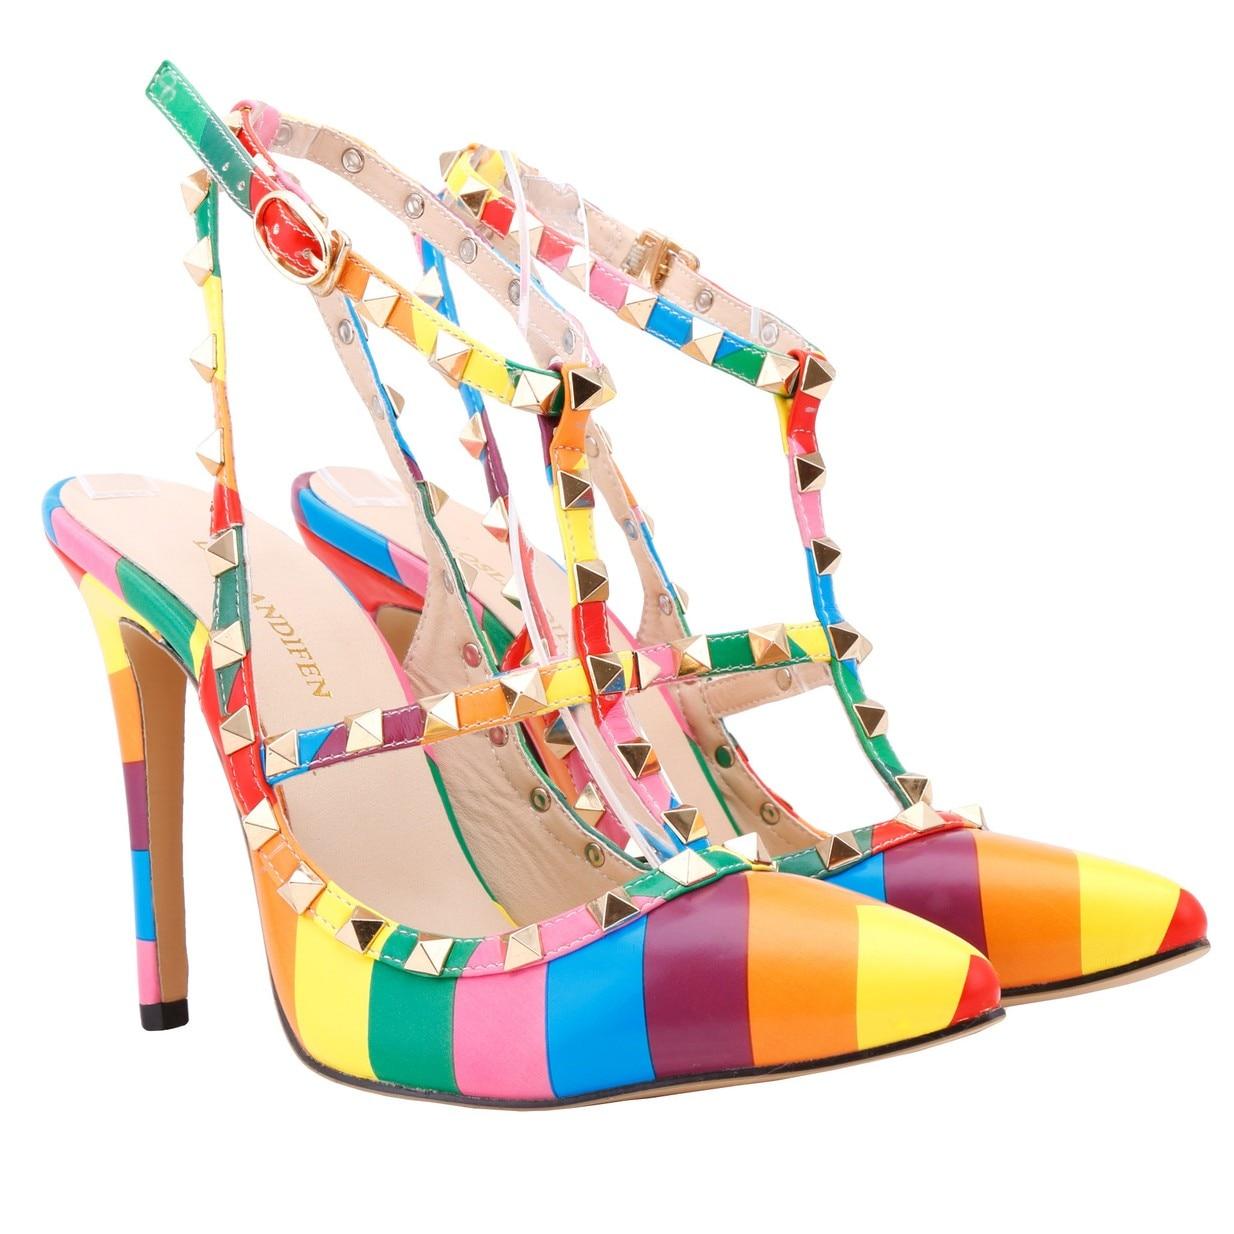 Black rainbow sandals with crystals - Rainbow Sandals